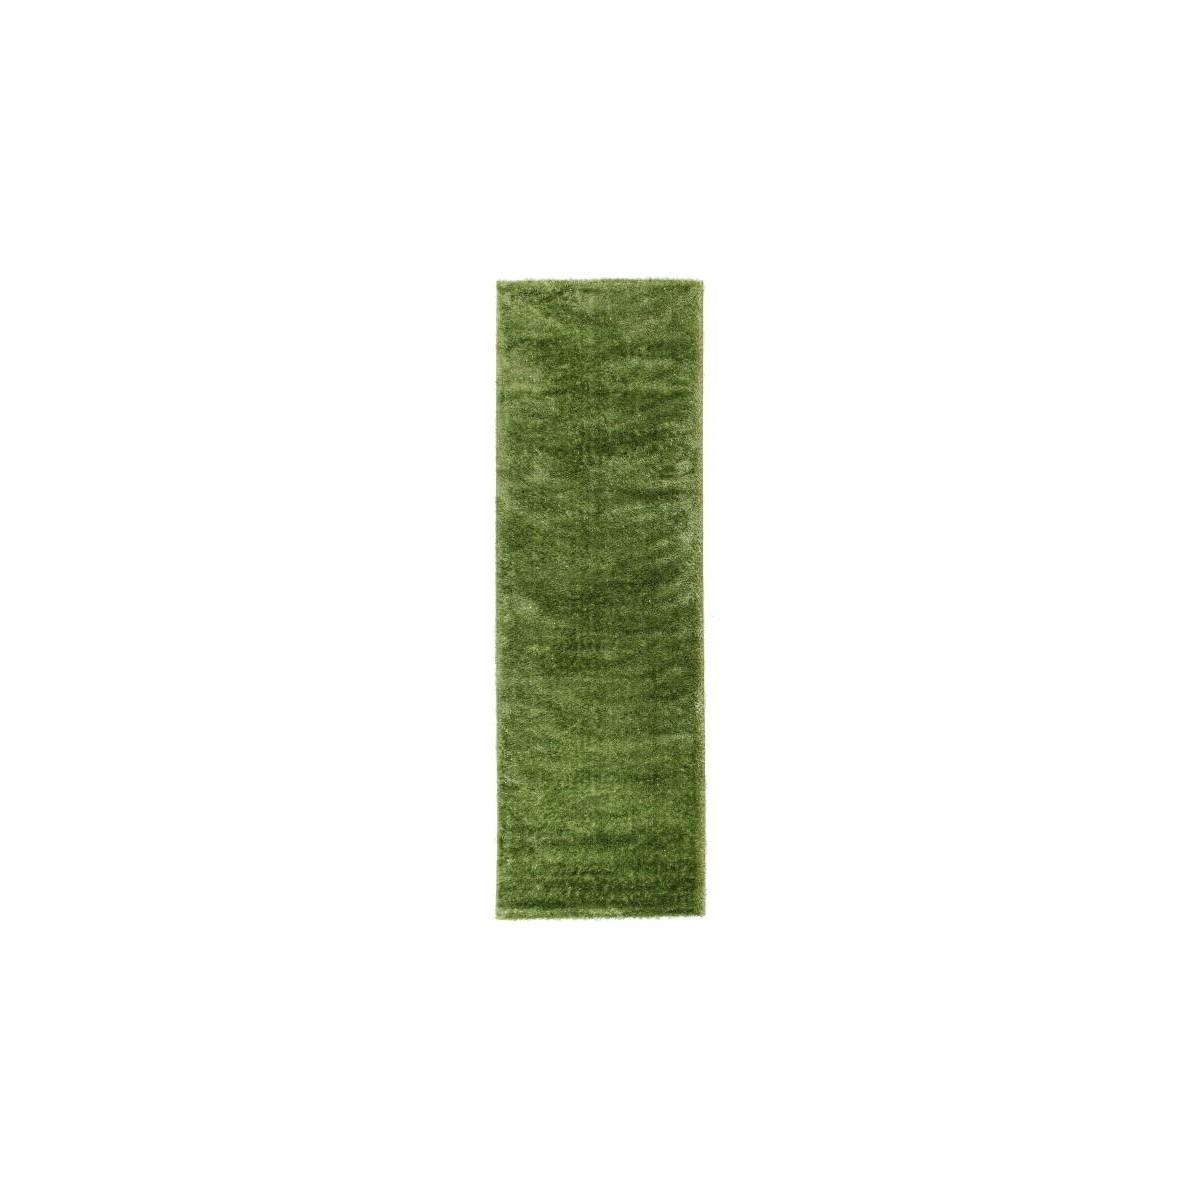 korridor soft shaggy matte und glanzende 80 x 300 cm zottigen moonlight grun amp story 5304